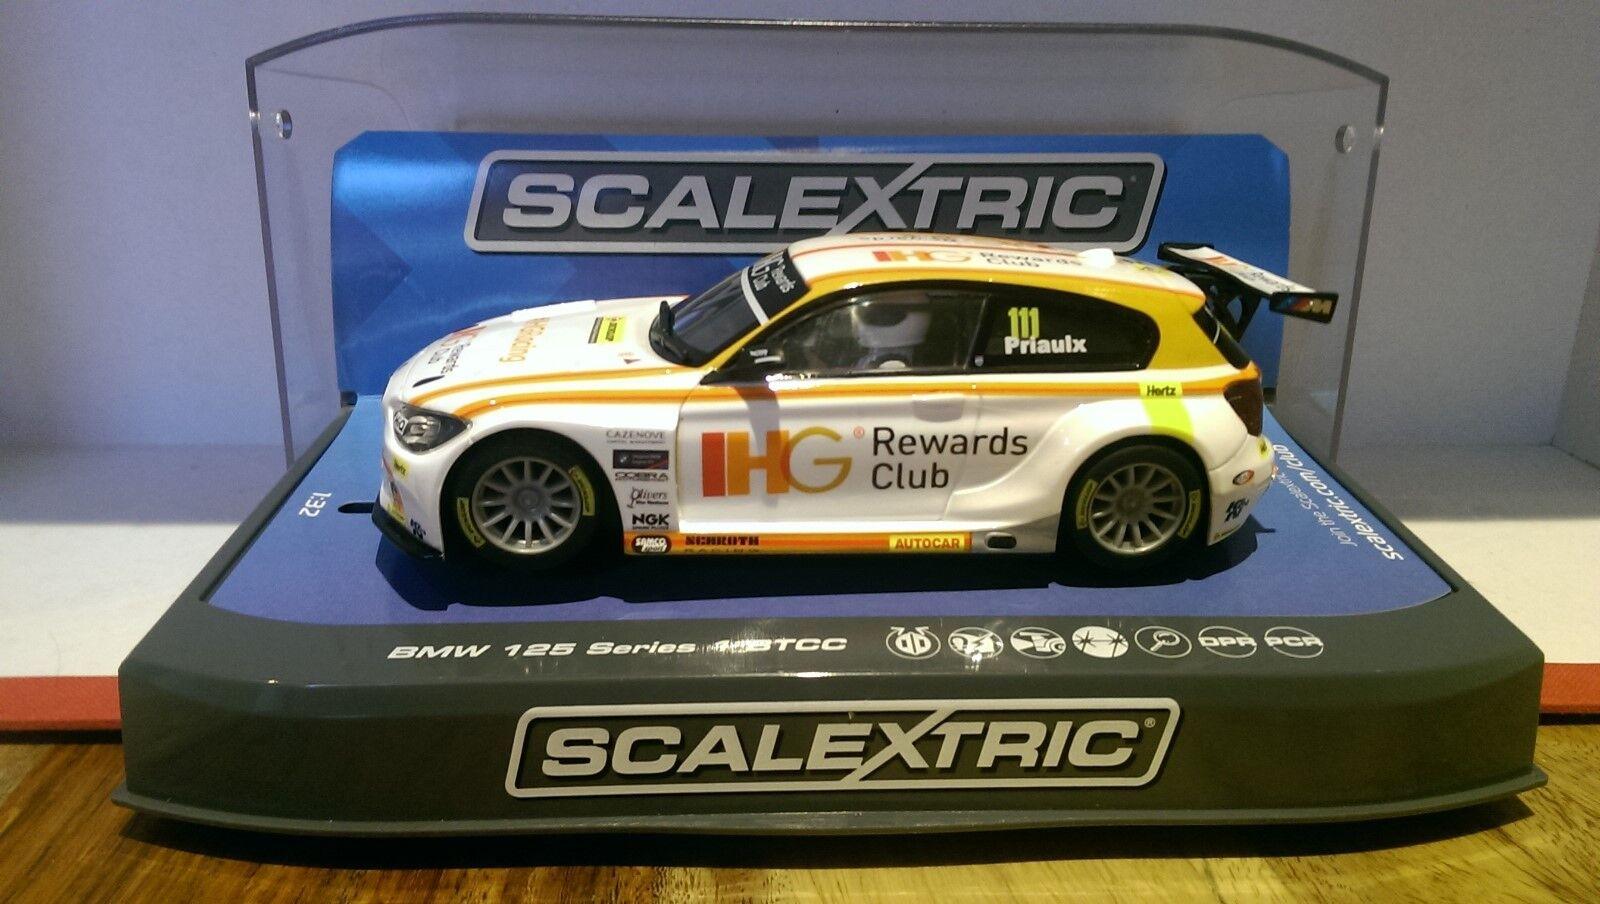 SCALEXTRIC C3784 BMW 125 Series 1 2015 BTCC IHG Andy Priaulx No.111